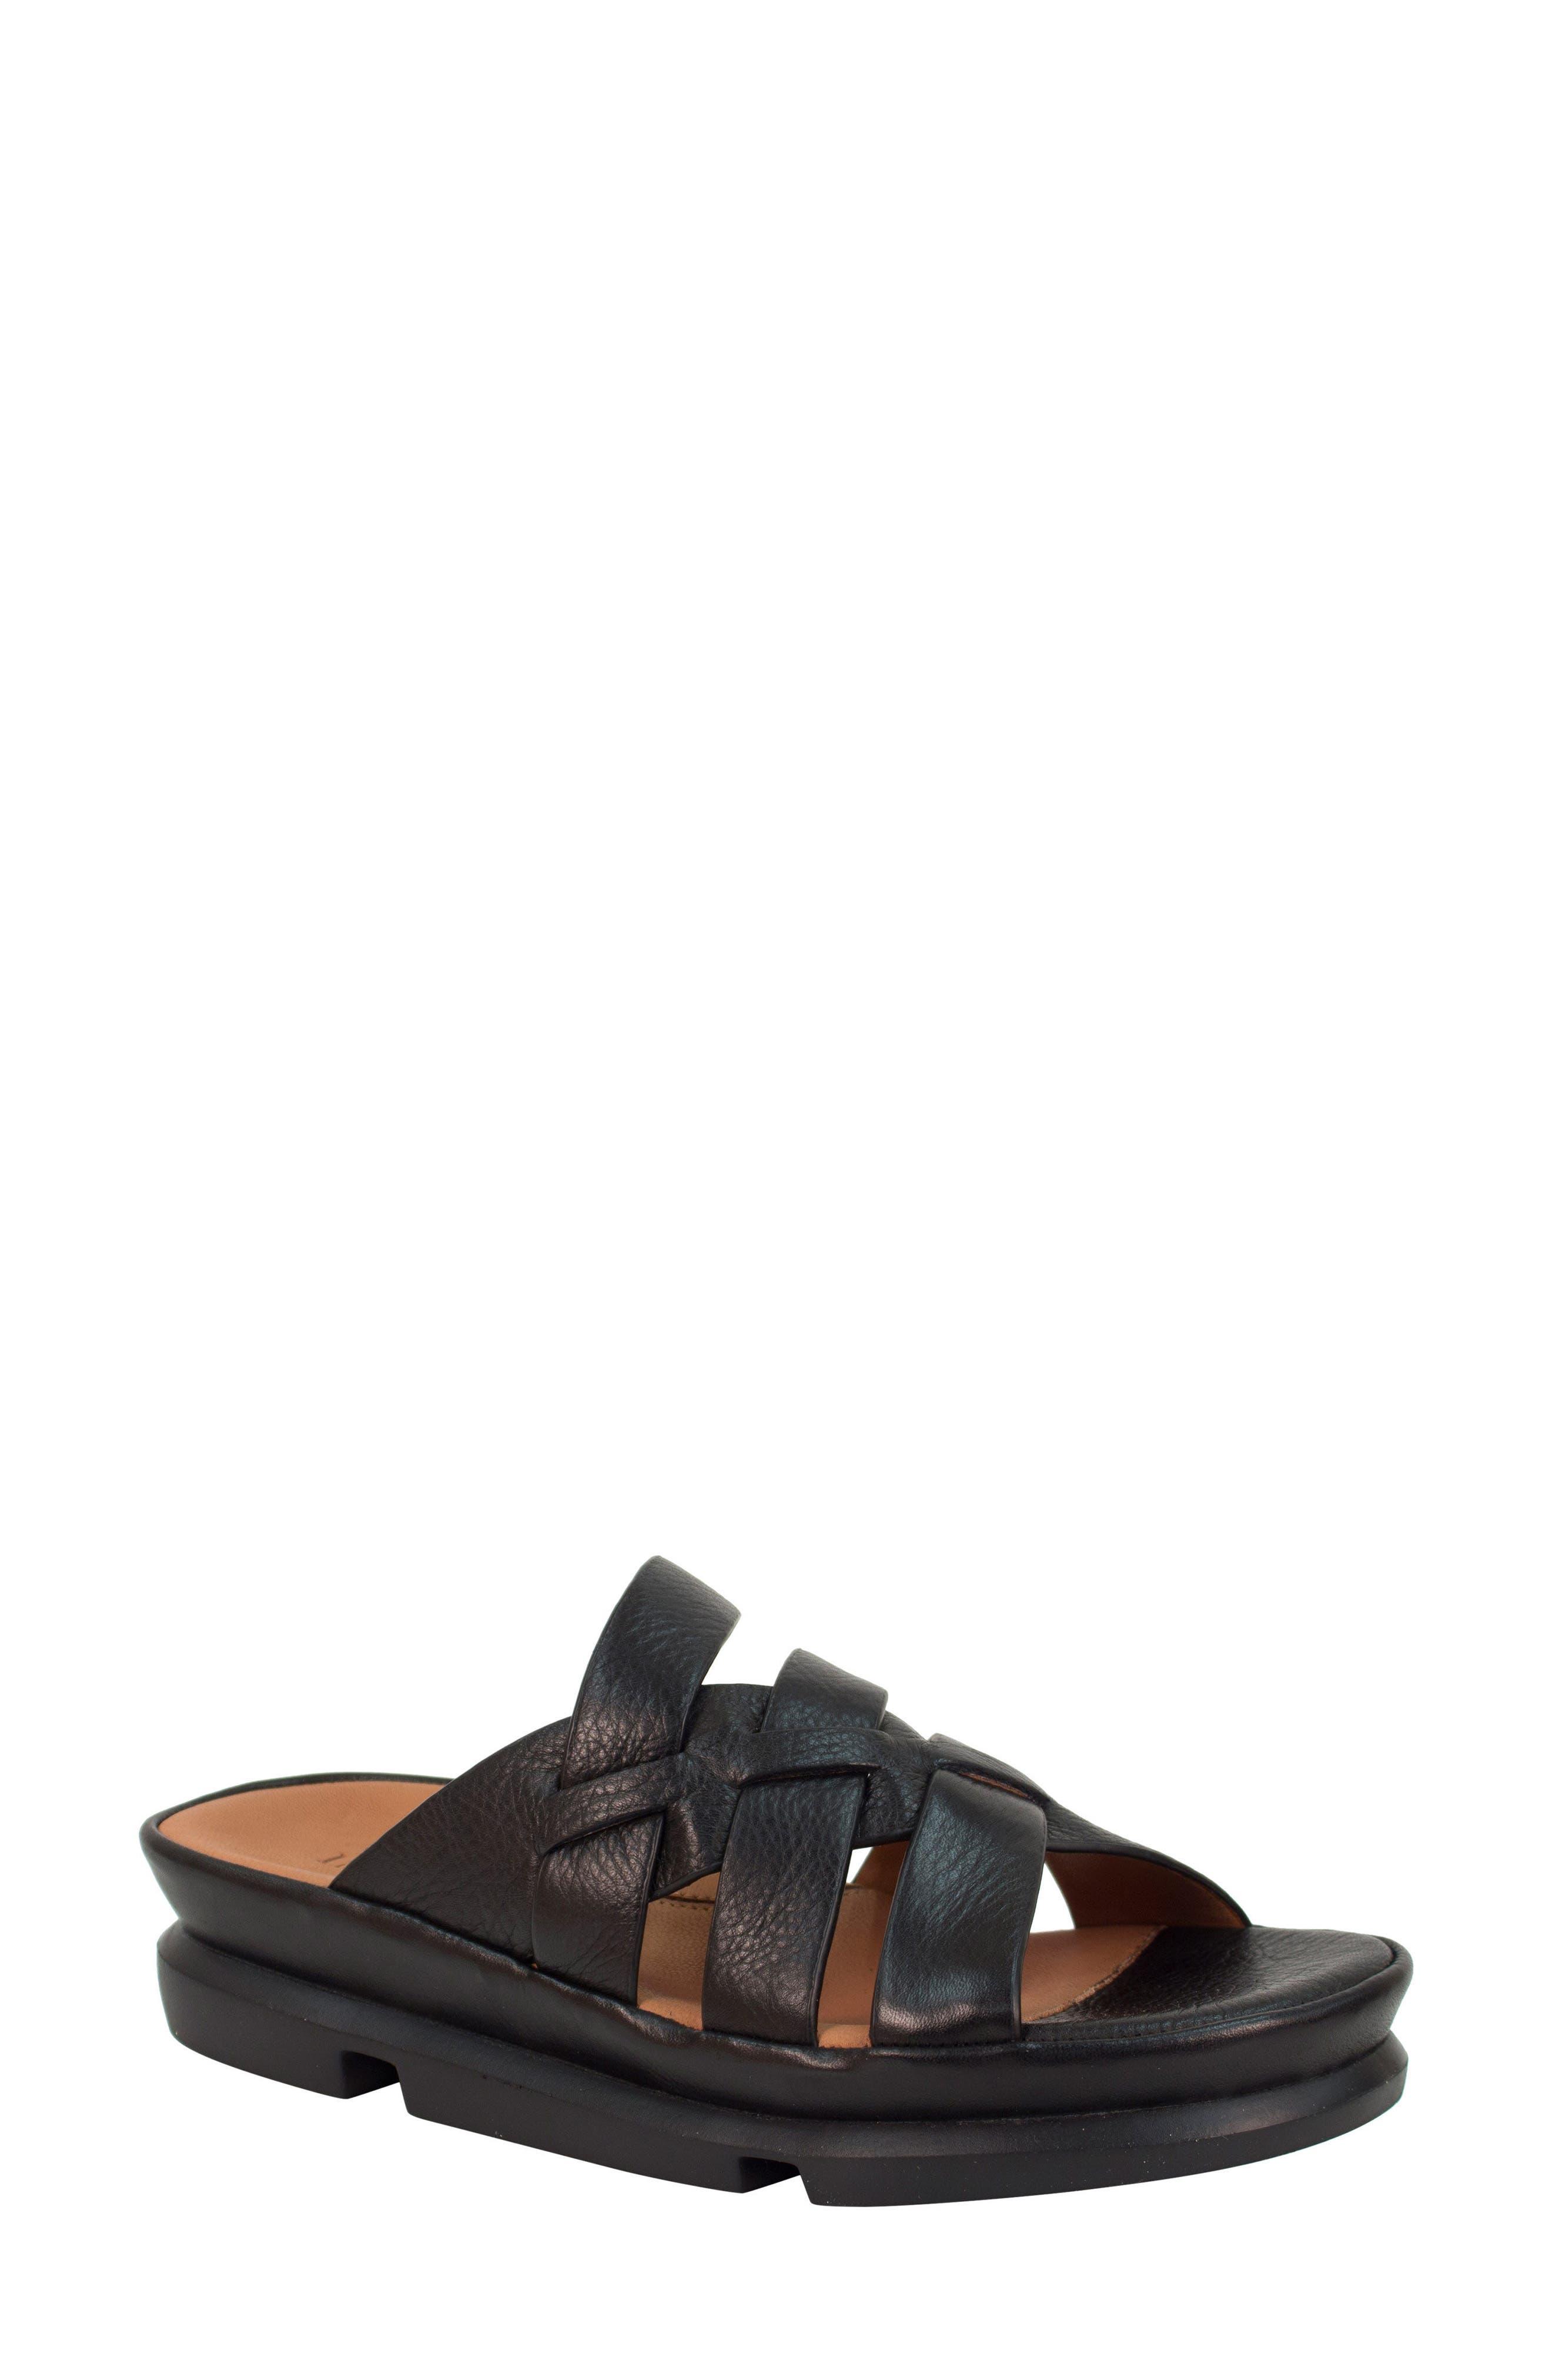 Veryl Sandal,                         Main,                         color, Black Leather